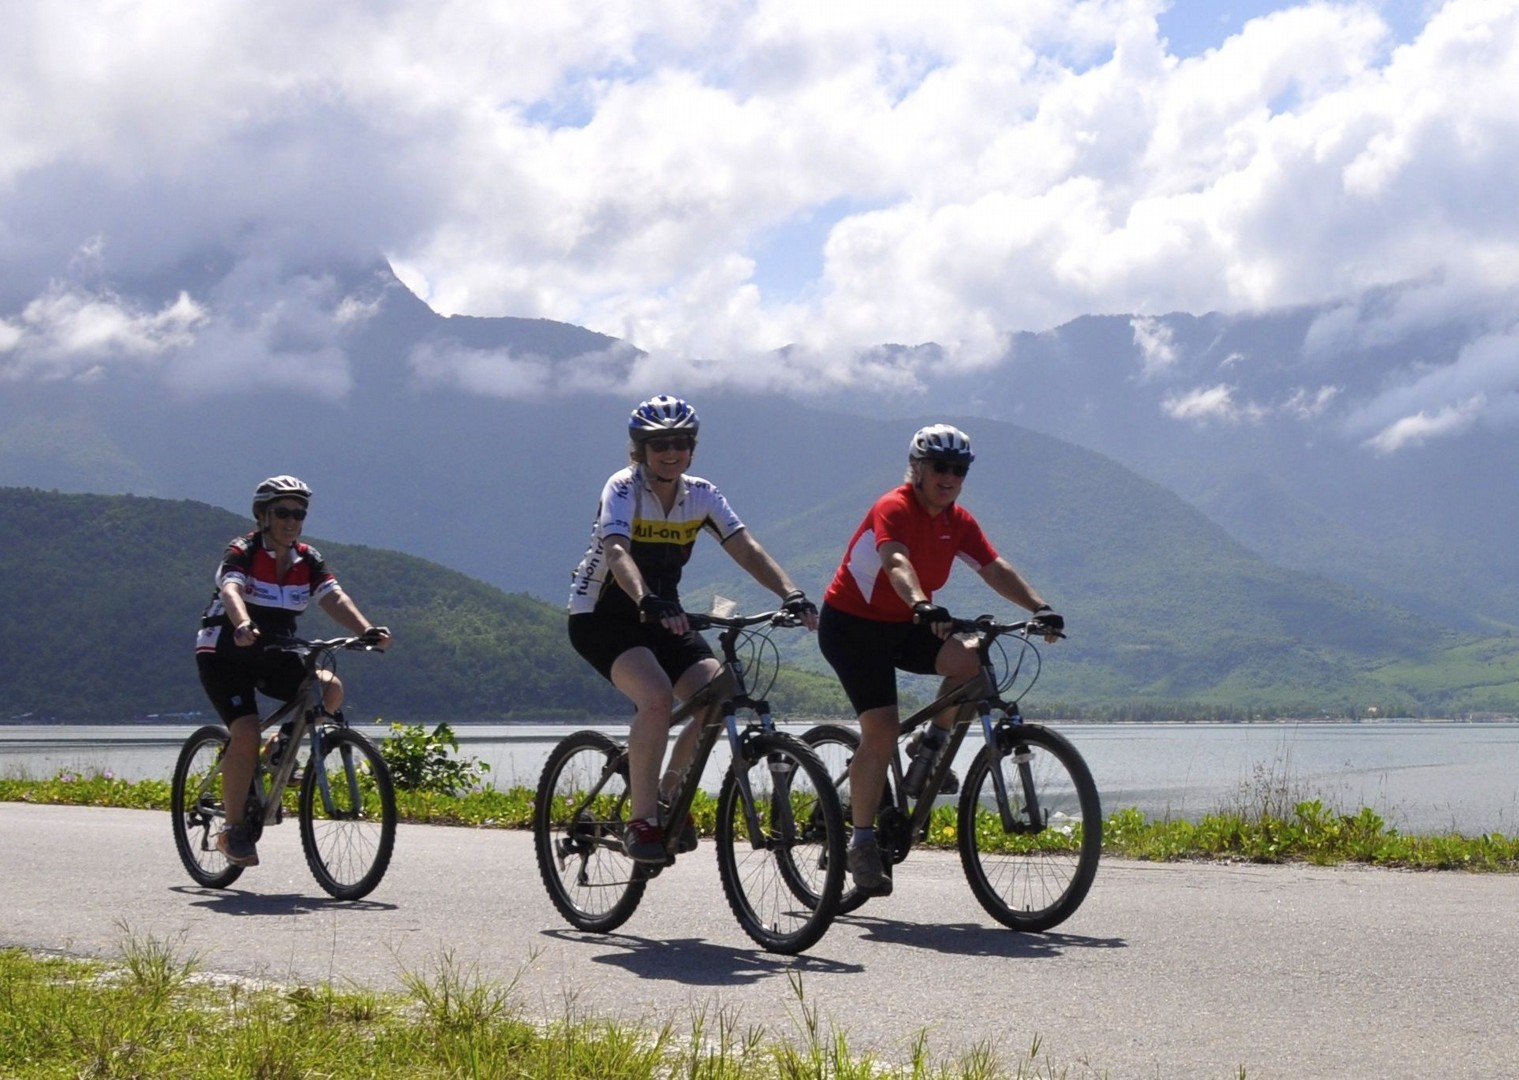 vietnamcycling holiday3.jpg - Laos - Hidden Treasures - Cycling Adventures